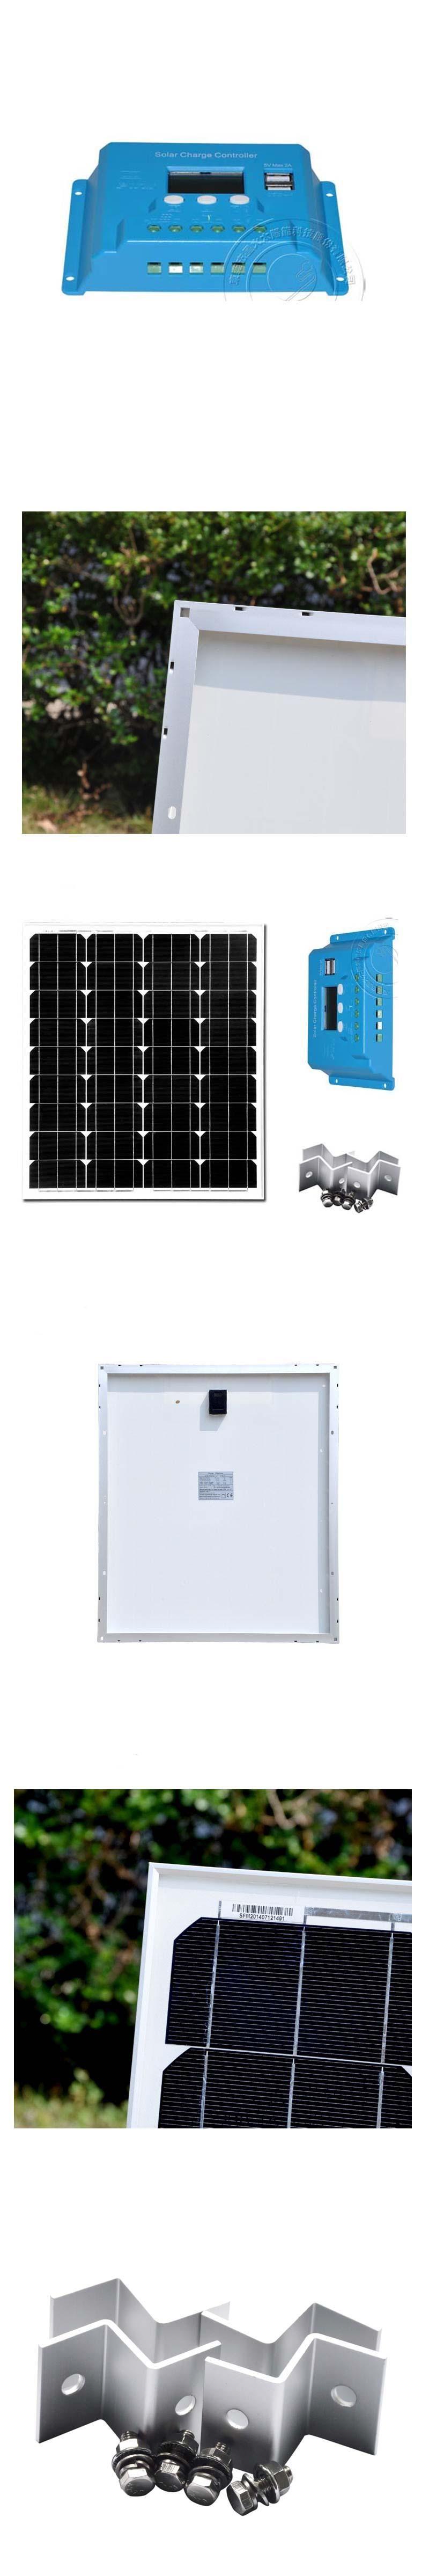 solar panel kits 70w 12v solar charger controller 10a 12v 24v pv